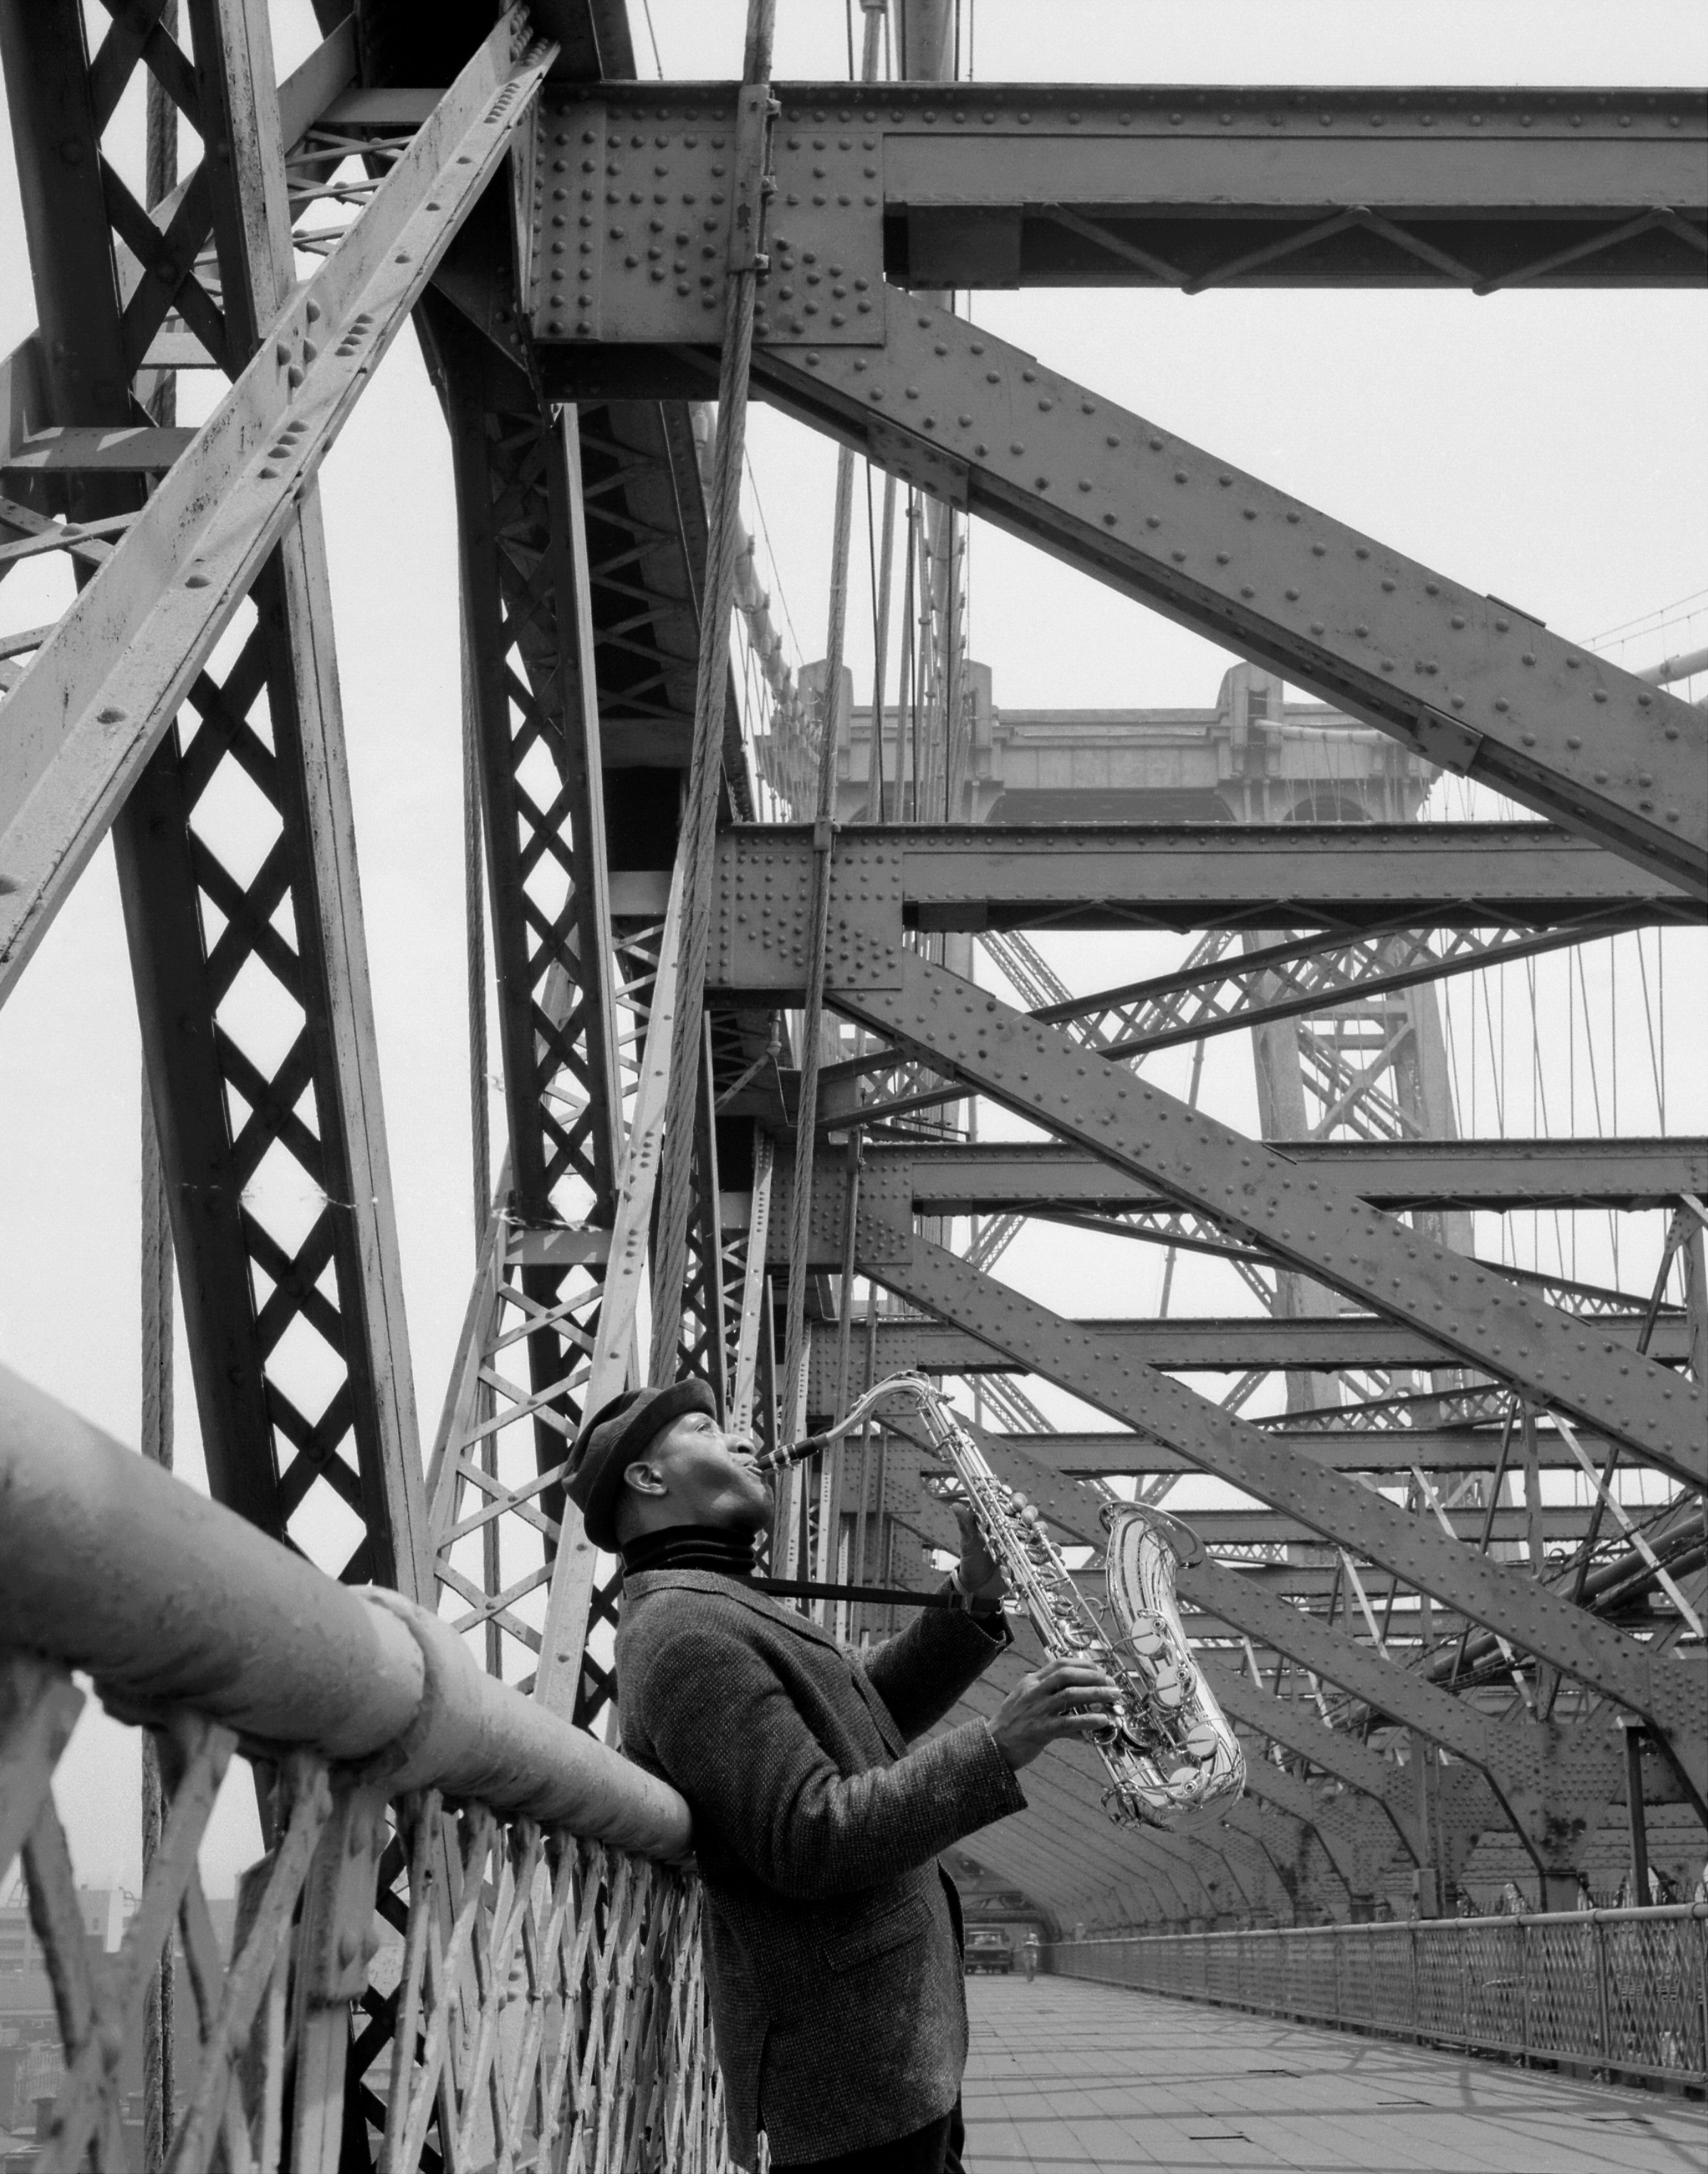 Sonny Rollins plays his saxophone on the Williamsburg Bridge, June 19, 1966.